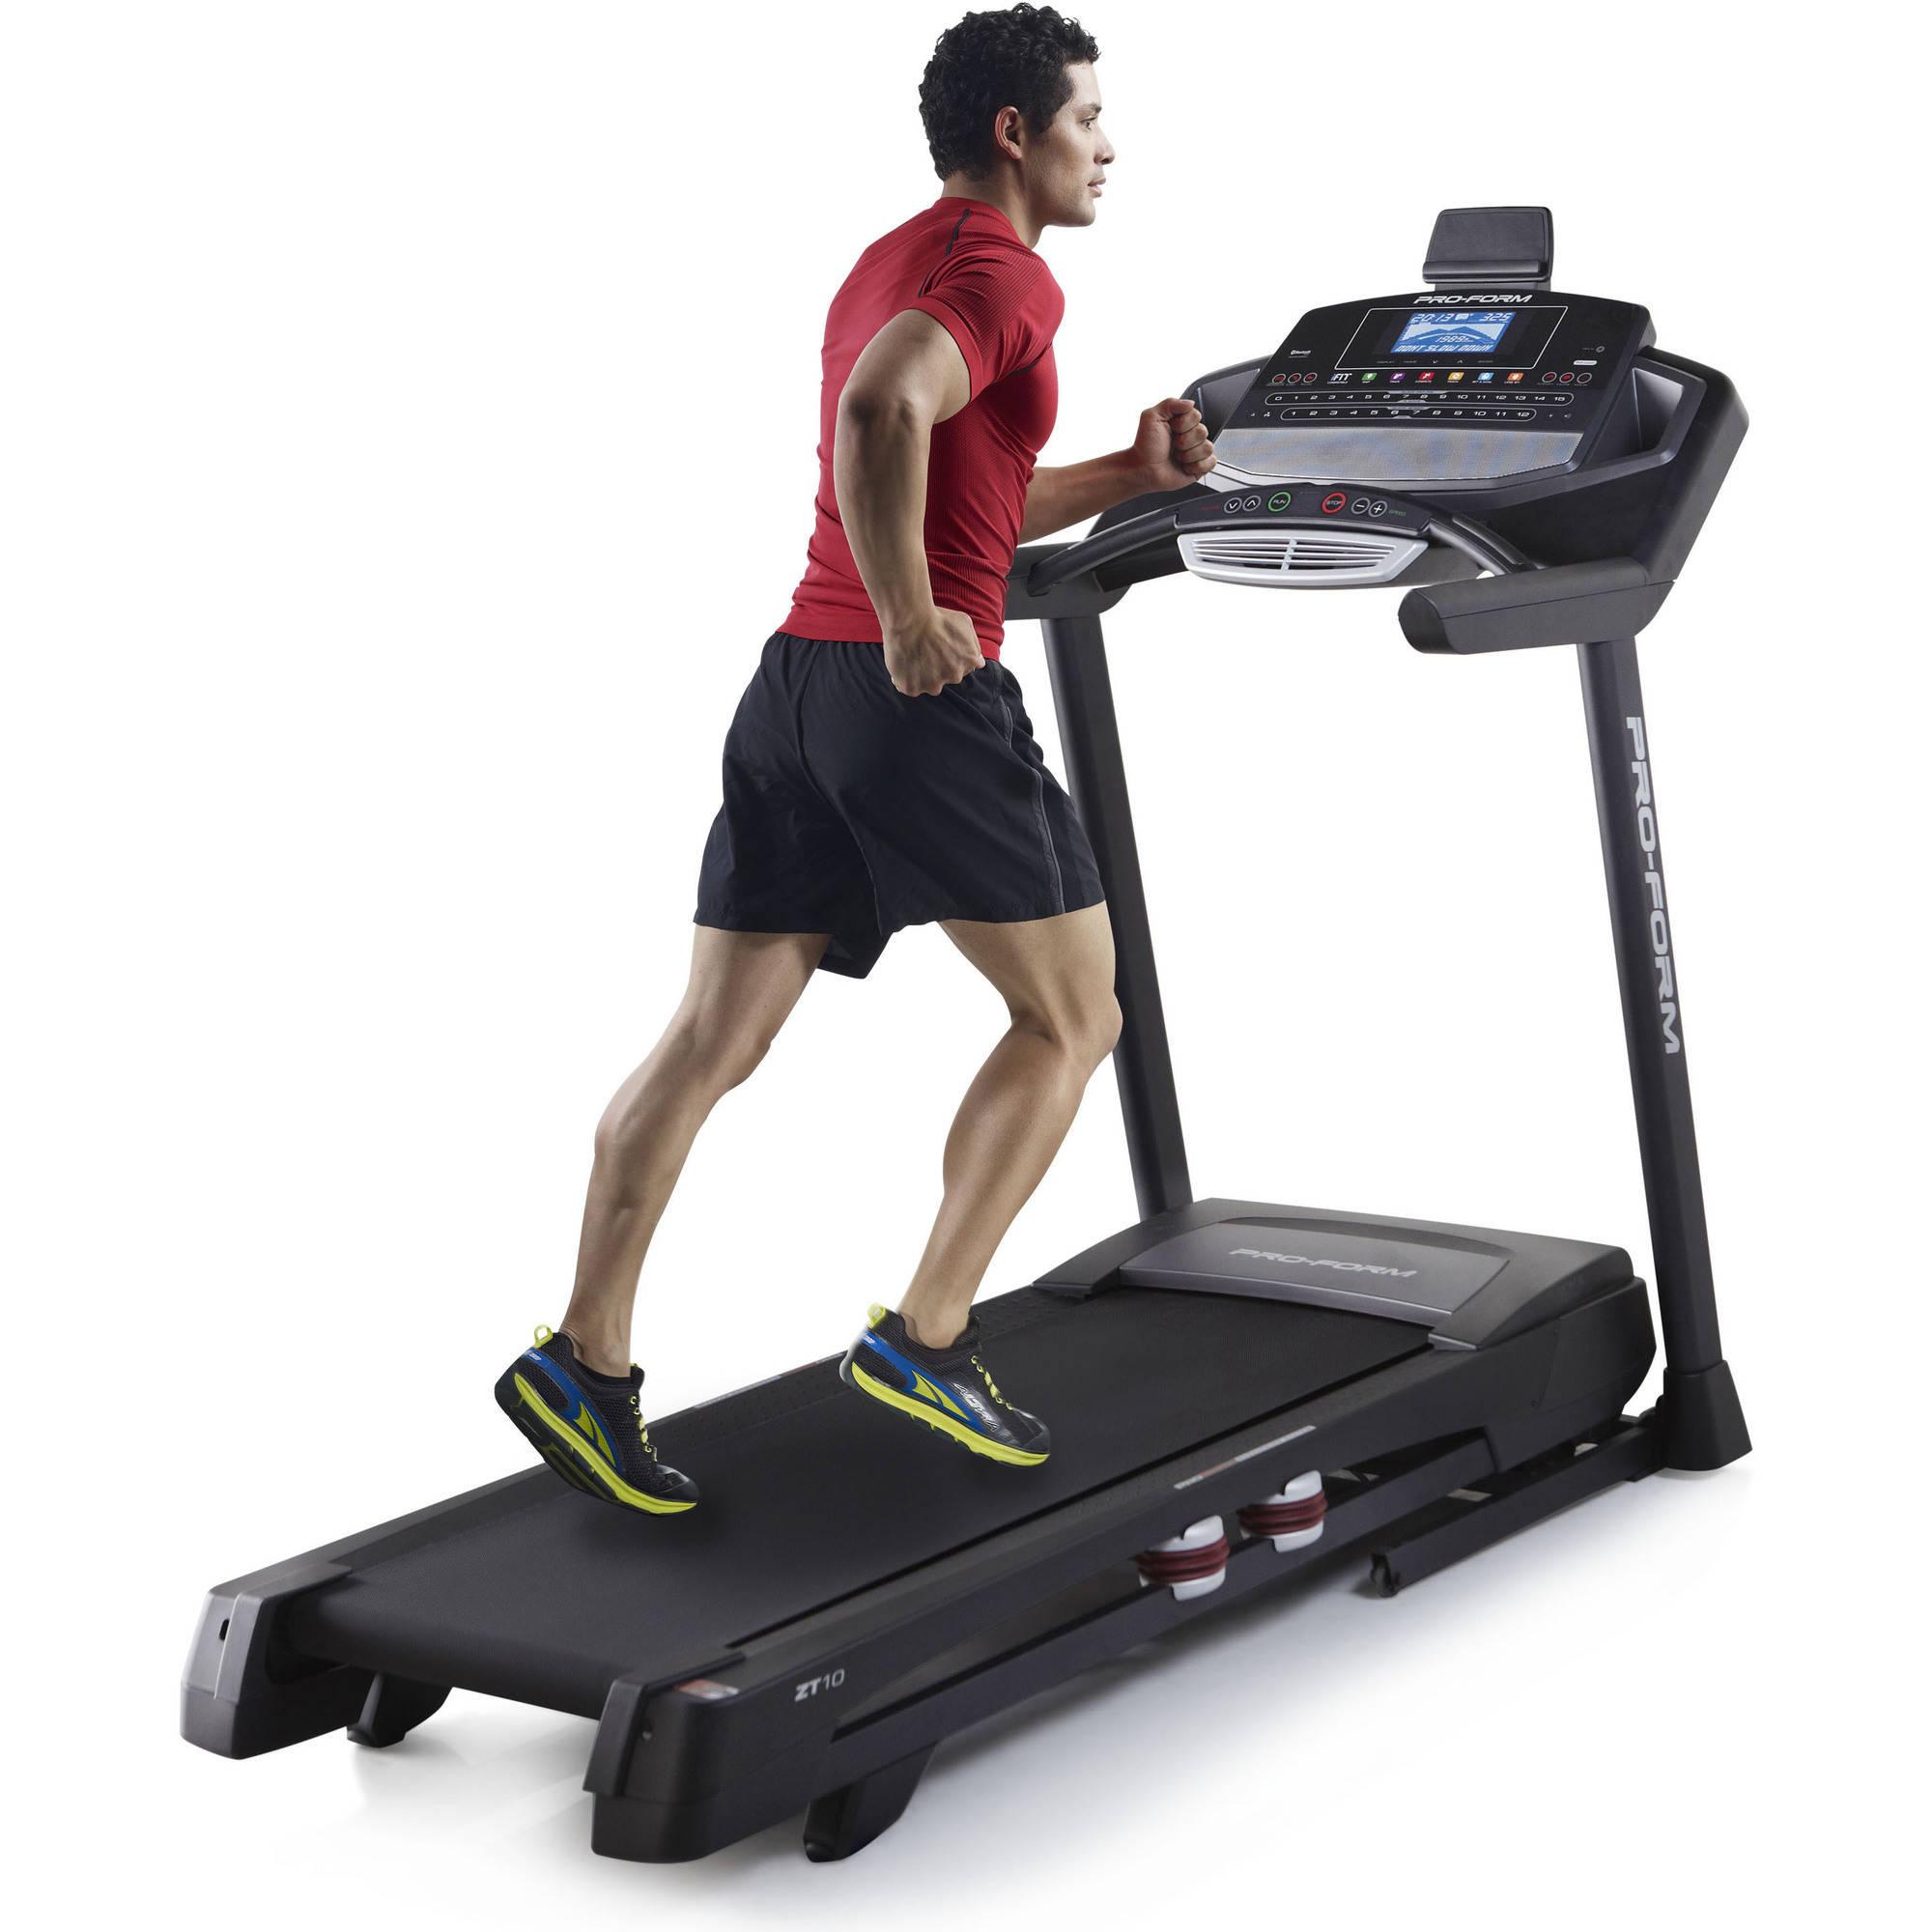 ProForm Power ZT 10 Folding Treadmill with Tablet Holder